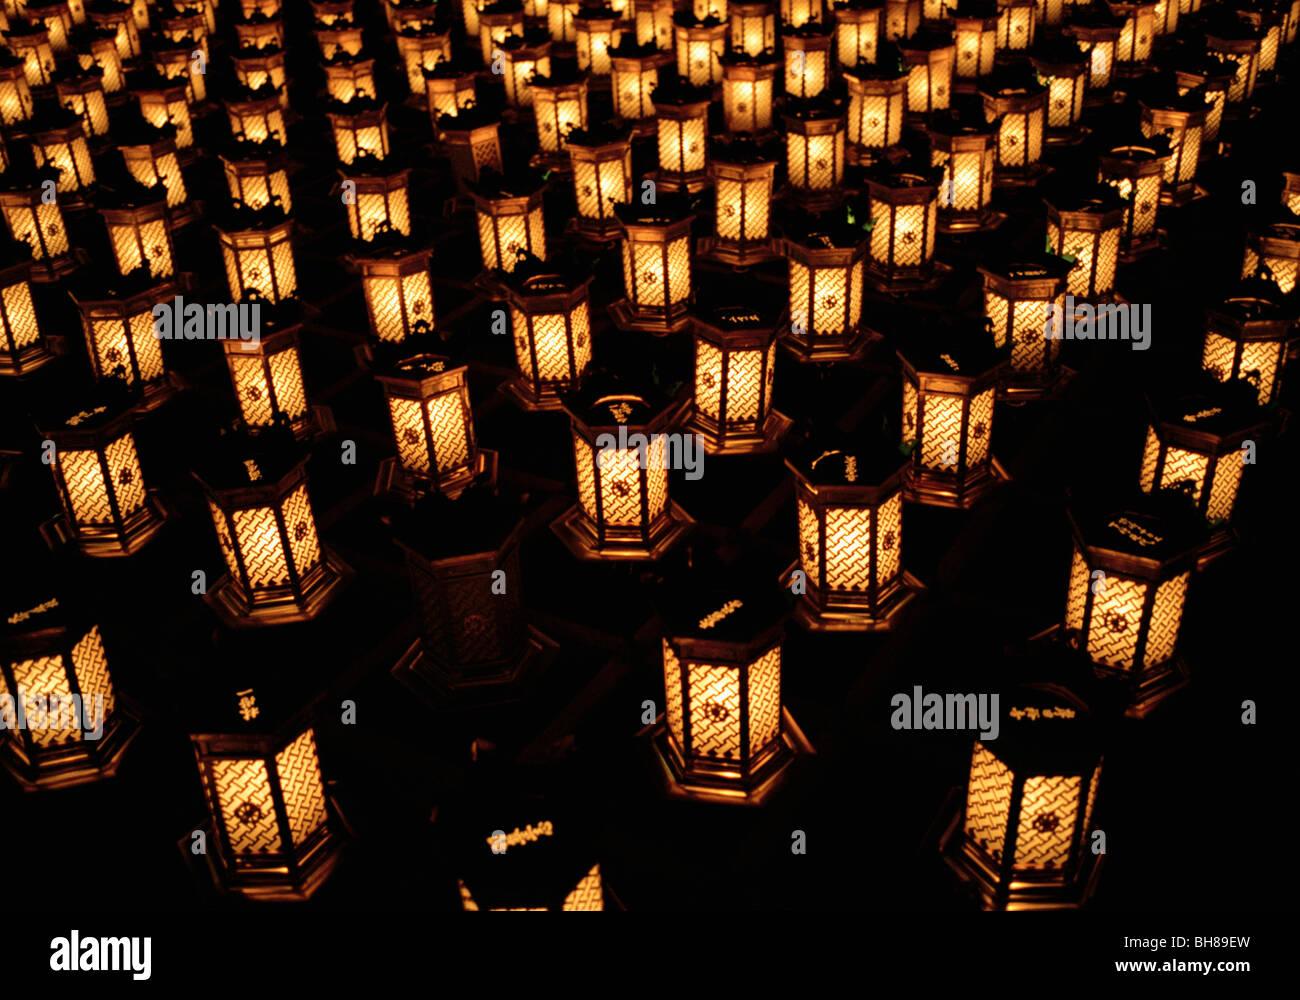 Illuminated lanterns arranged in rows, Miyajima, Japan Stock Photo